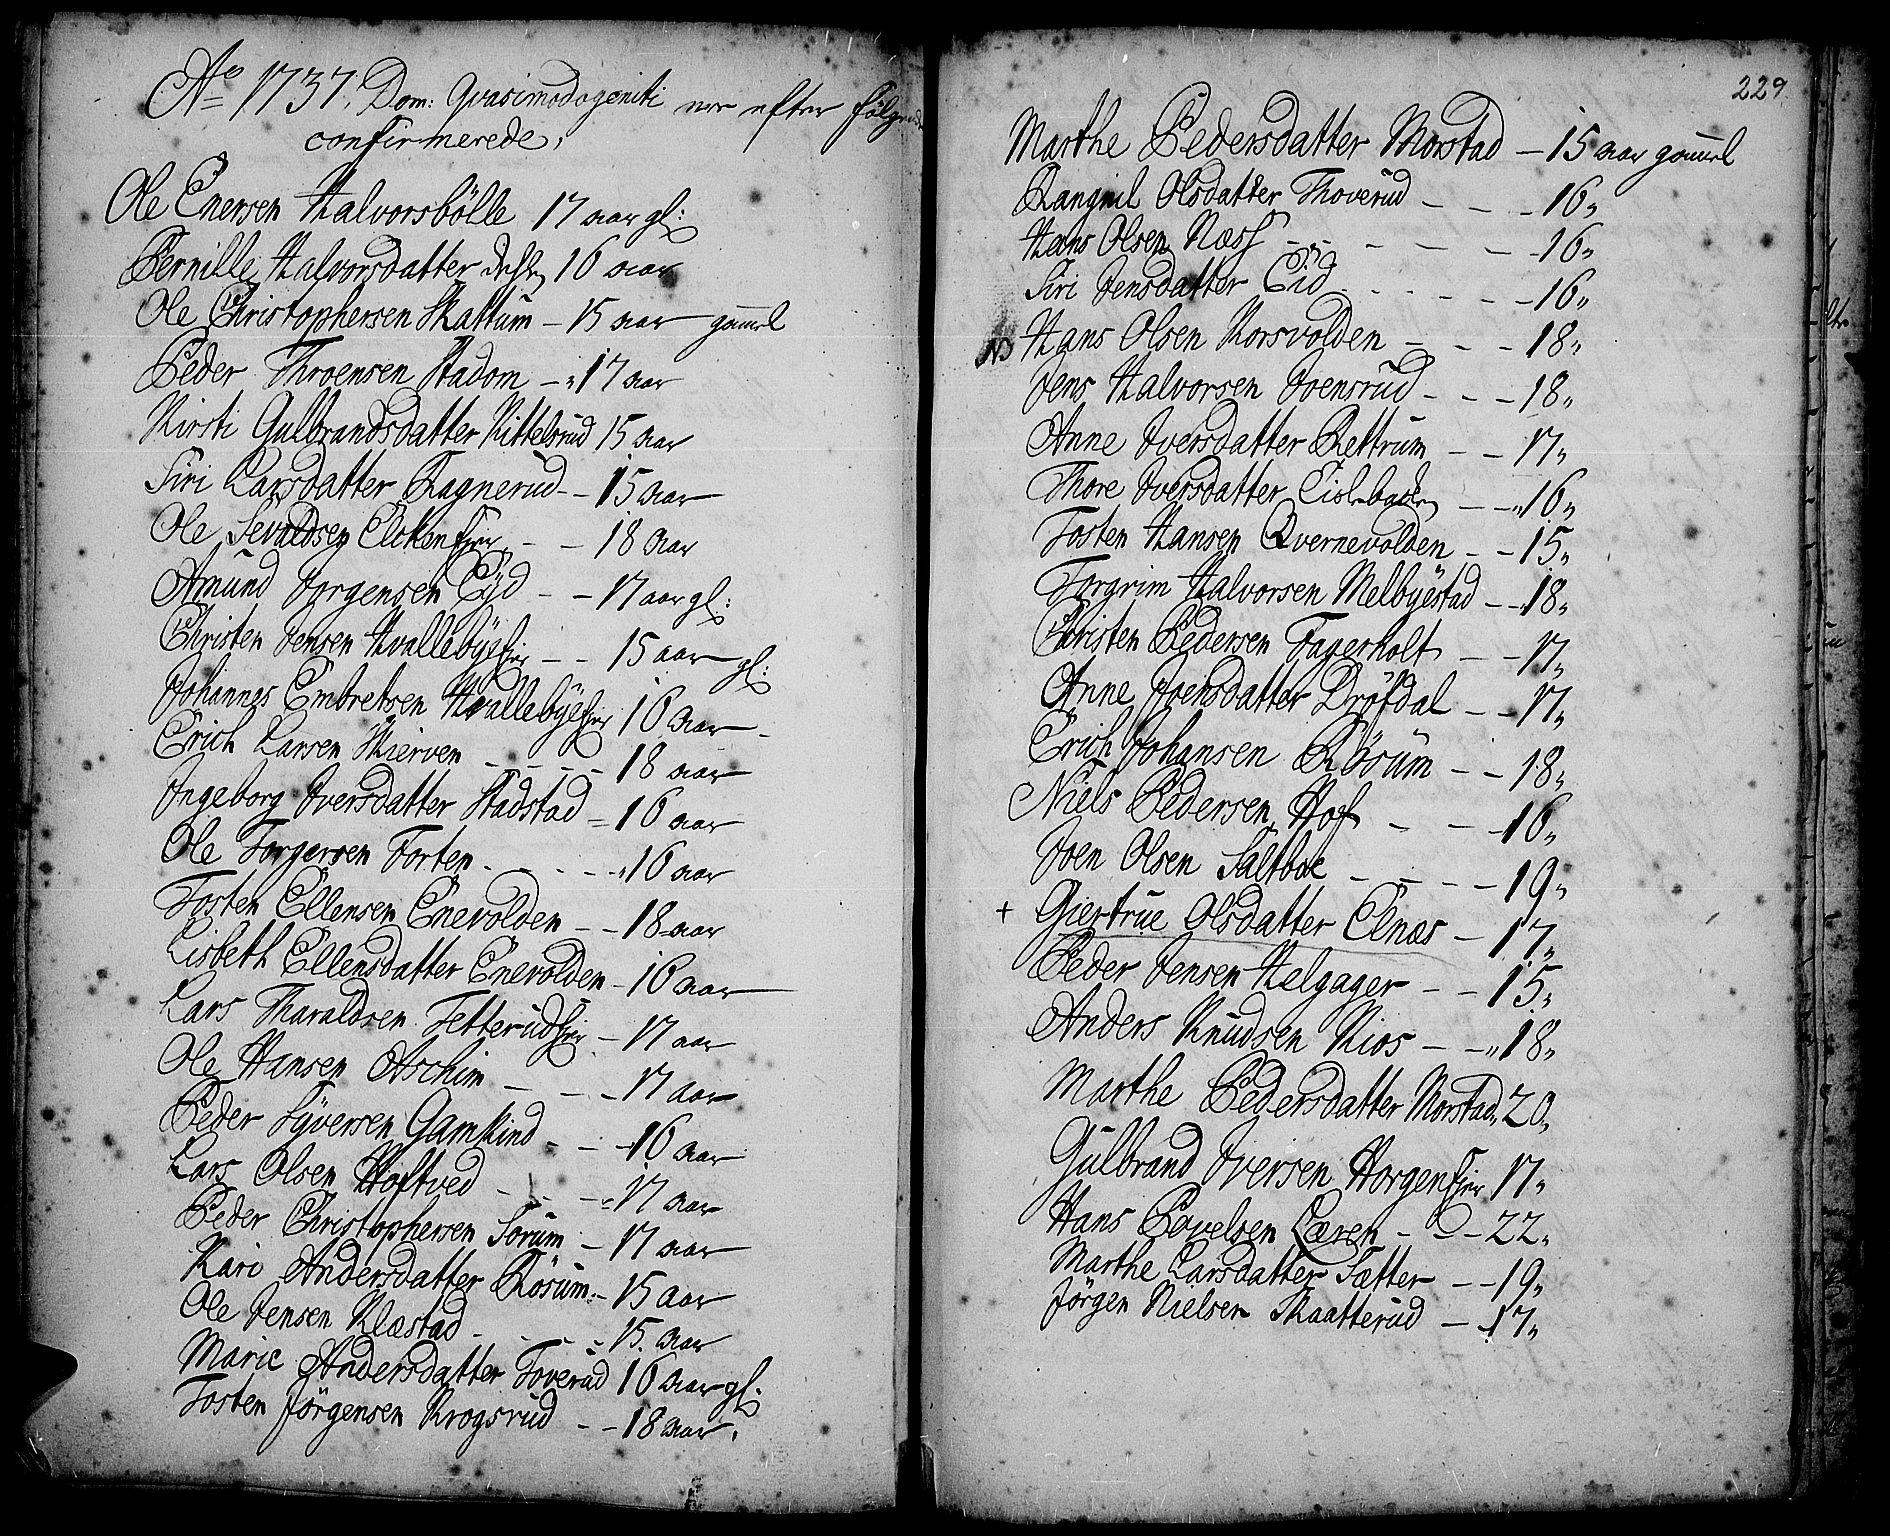 SAH, Gran prestekontor, Ministerialbok nr. 2, 1732-1744, s. 229